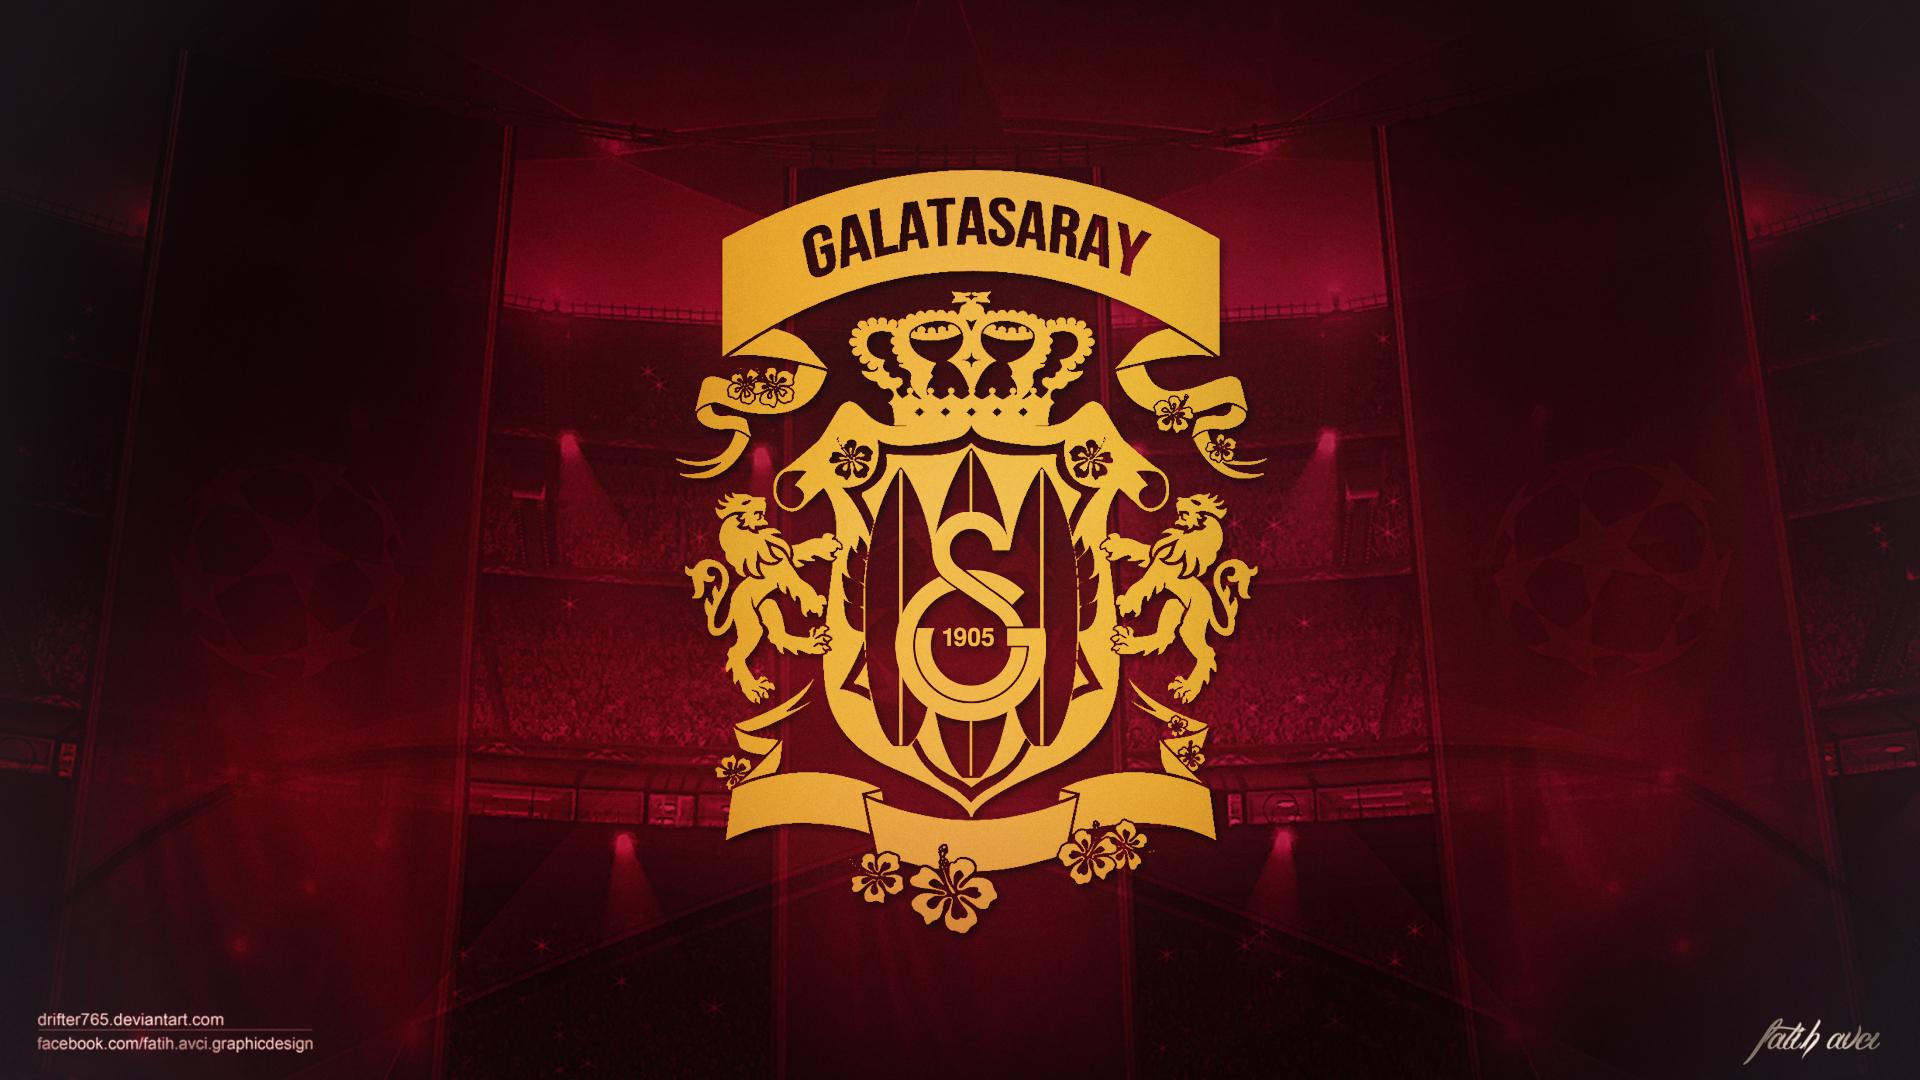 Galatasaray Royalty by drifter765 on DeviantArt